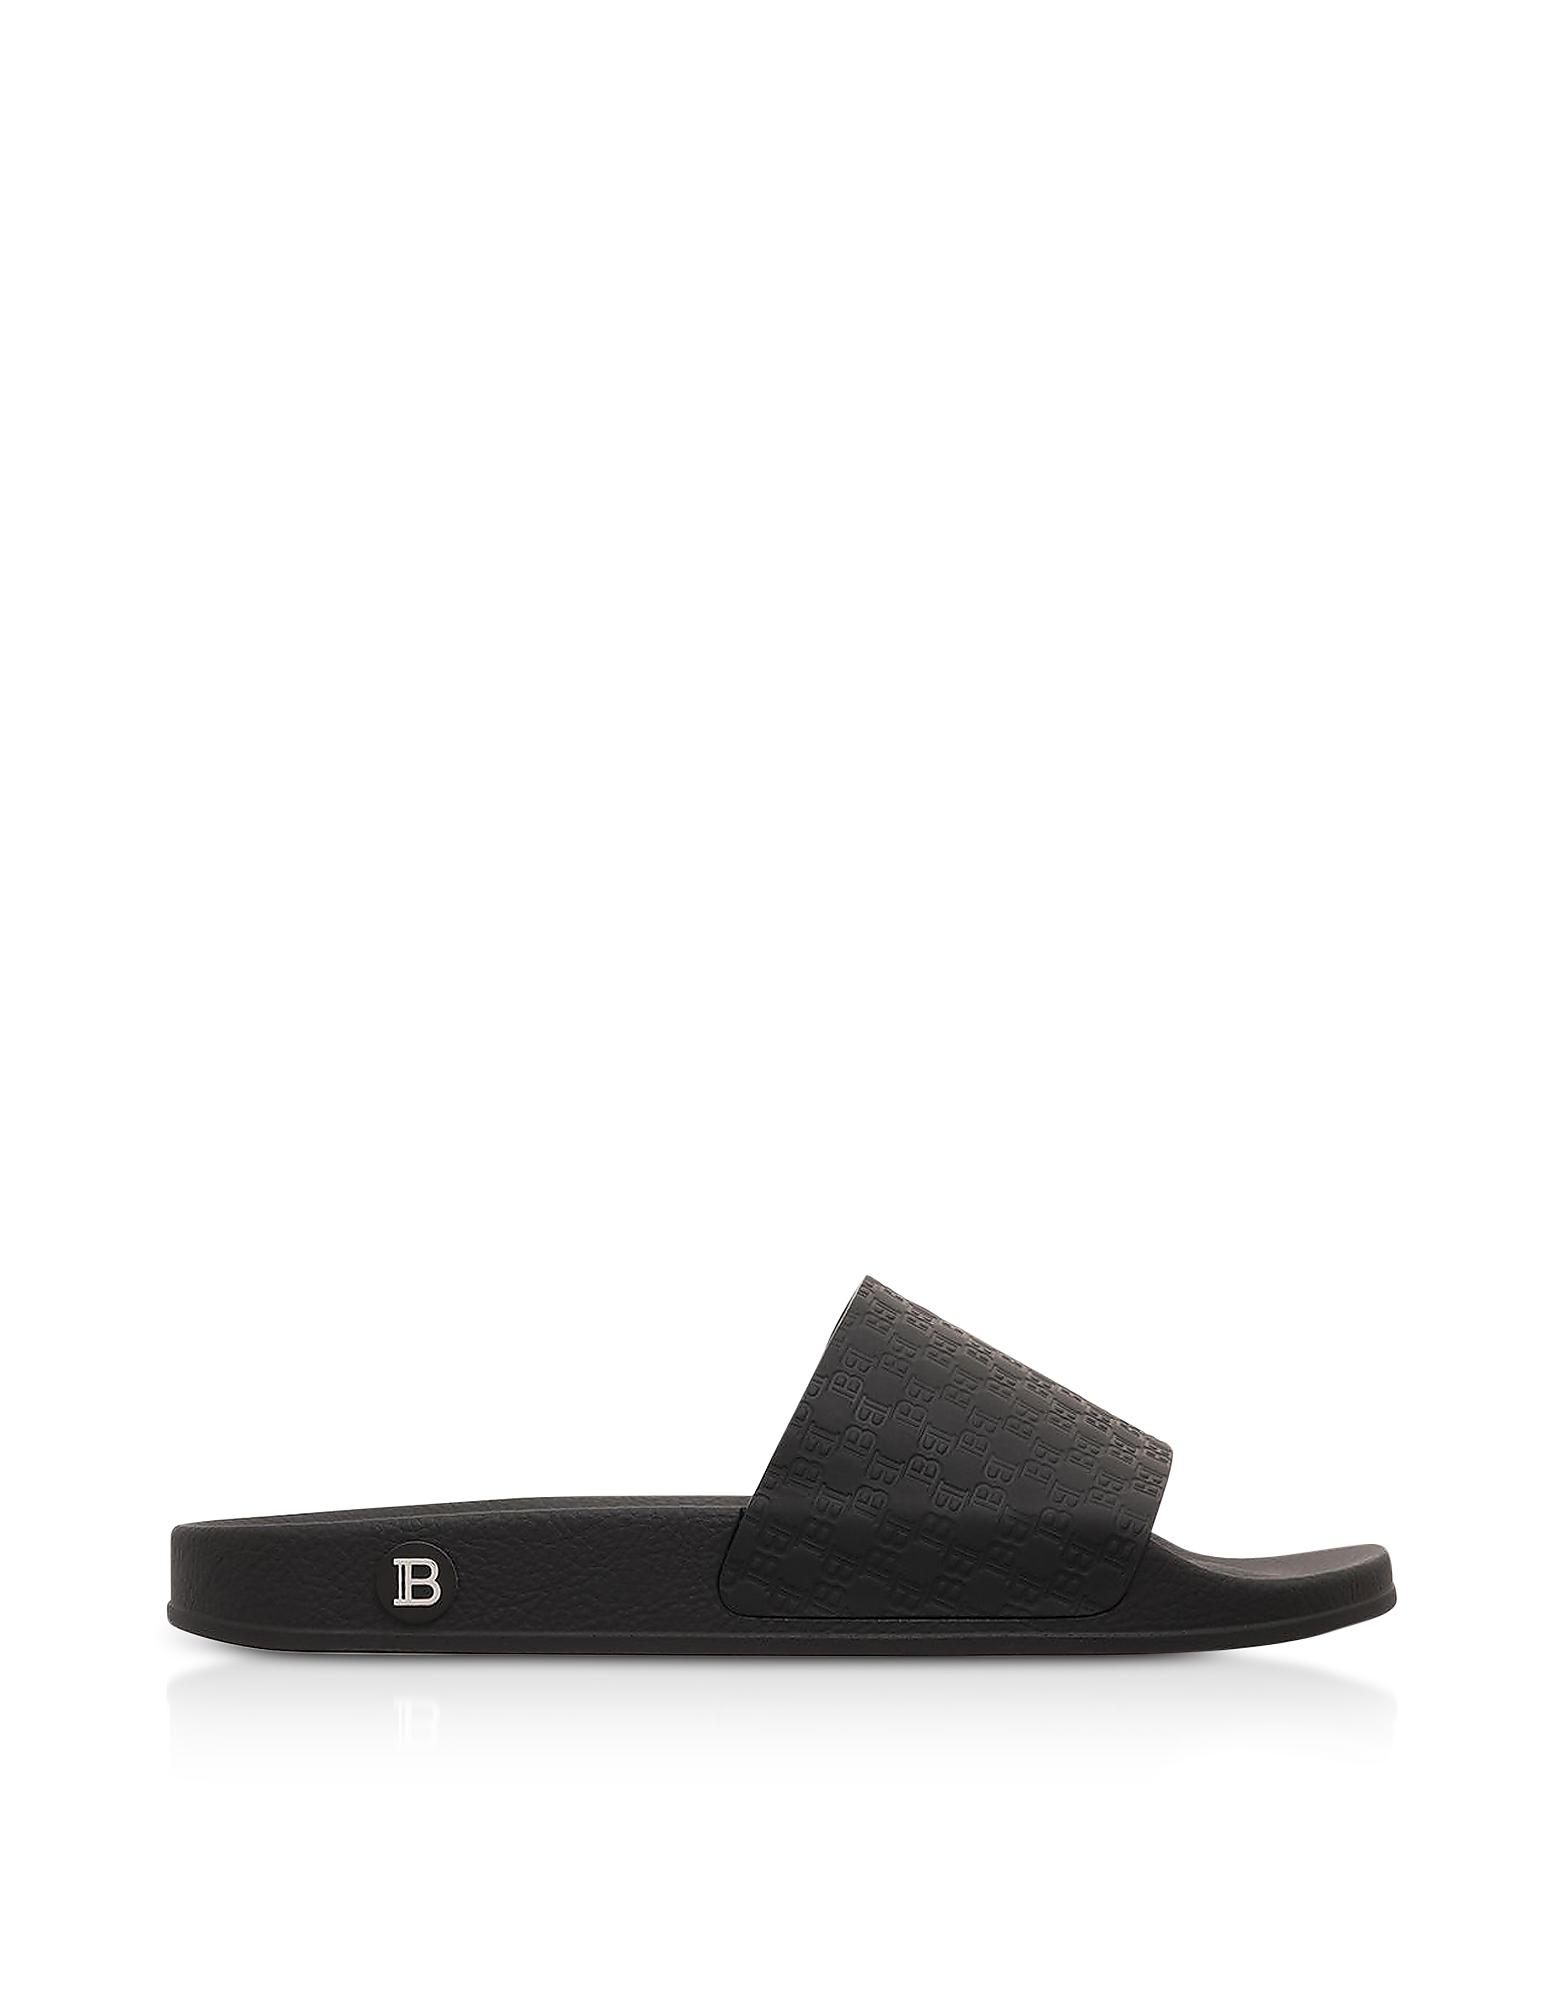 Balmain Designer Shoes, Black Men's Calypso Slide Sandals